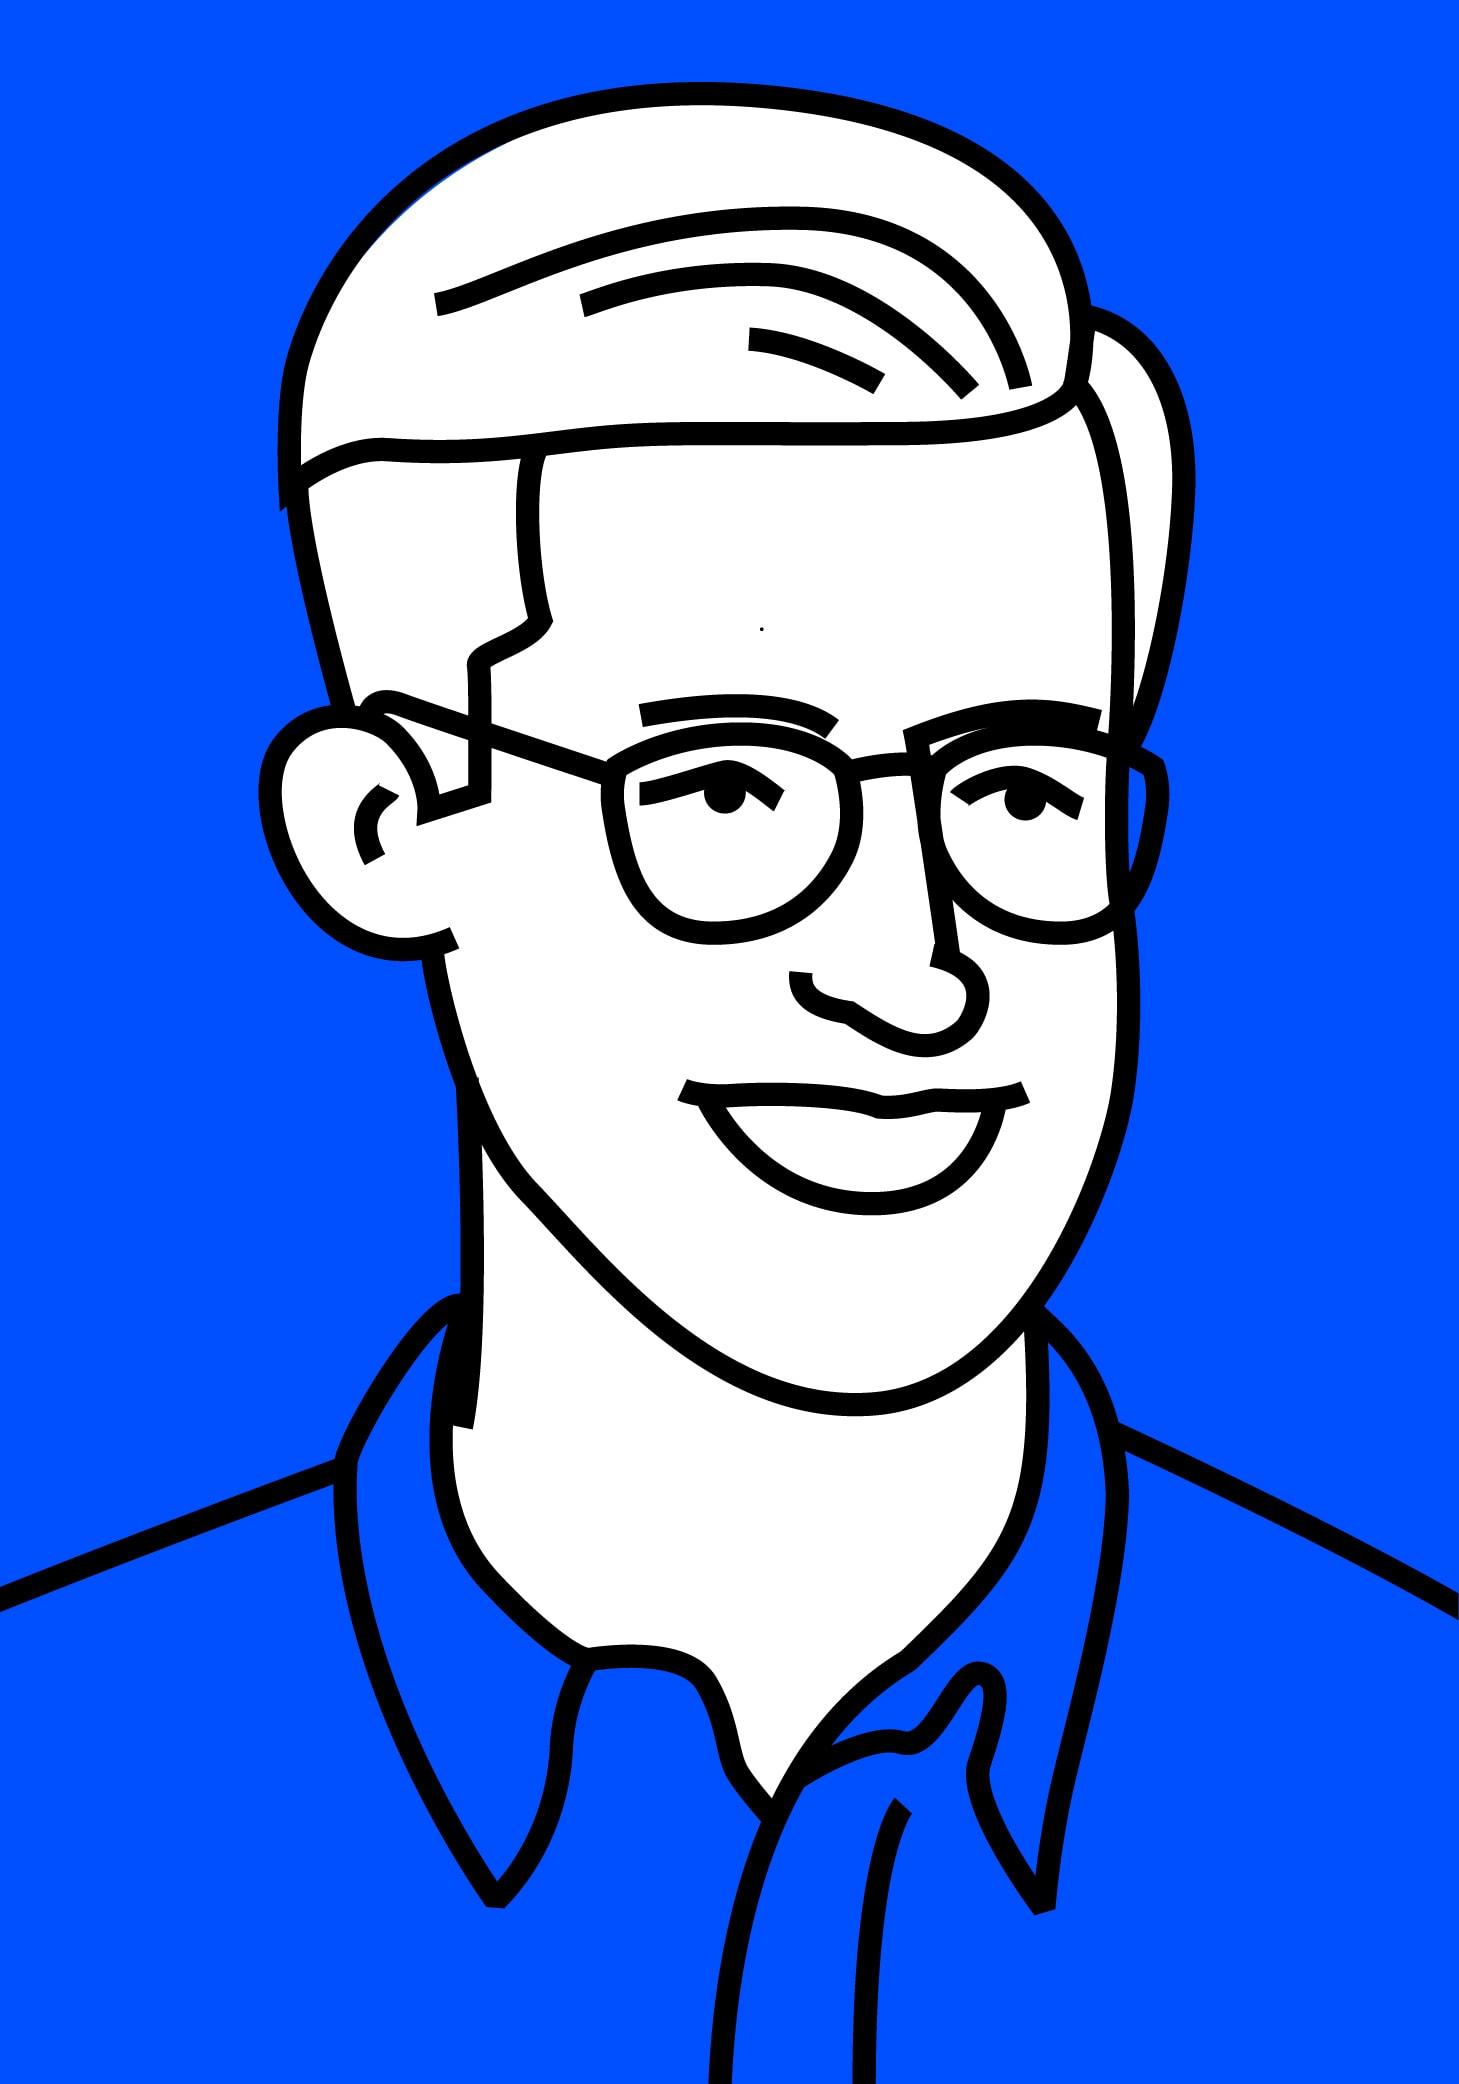 Philippe Henco, KittoKatsu, Illustration, Portrait